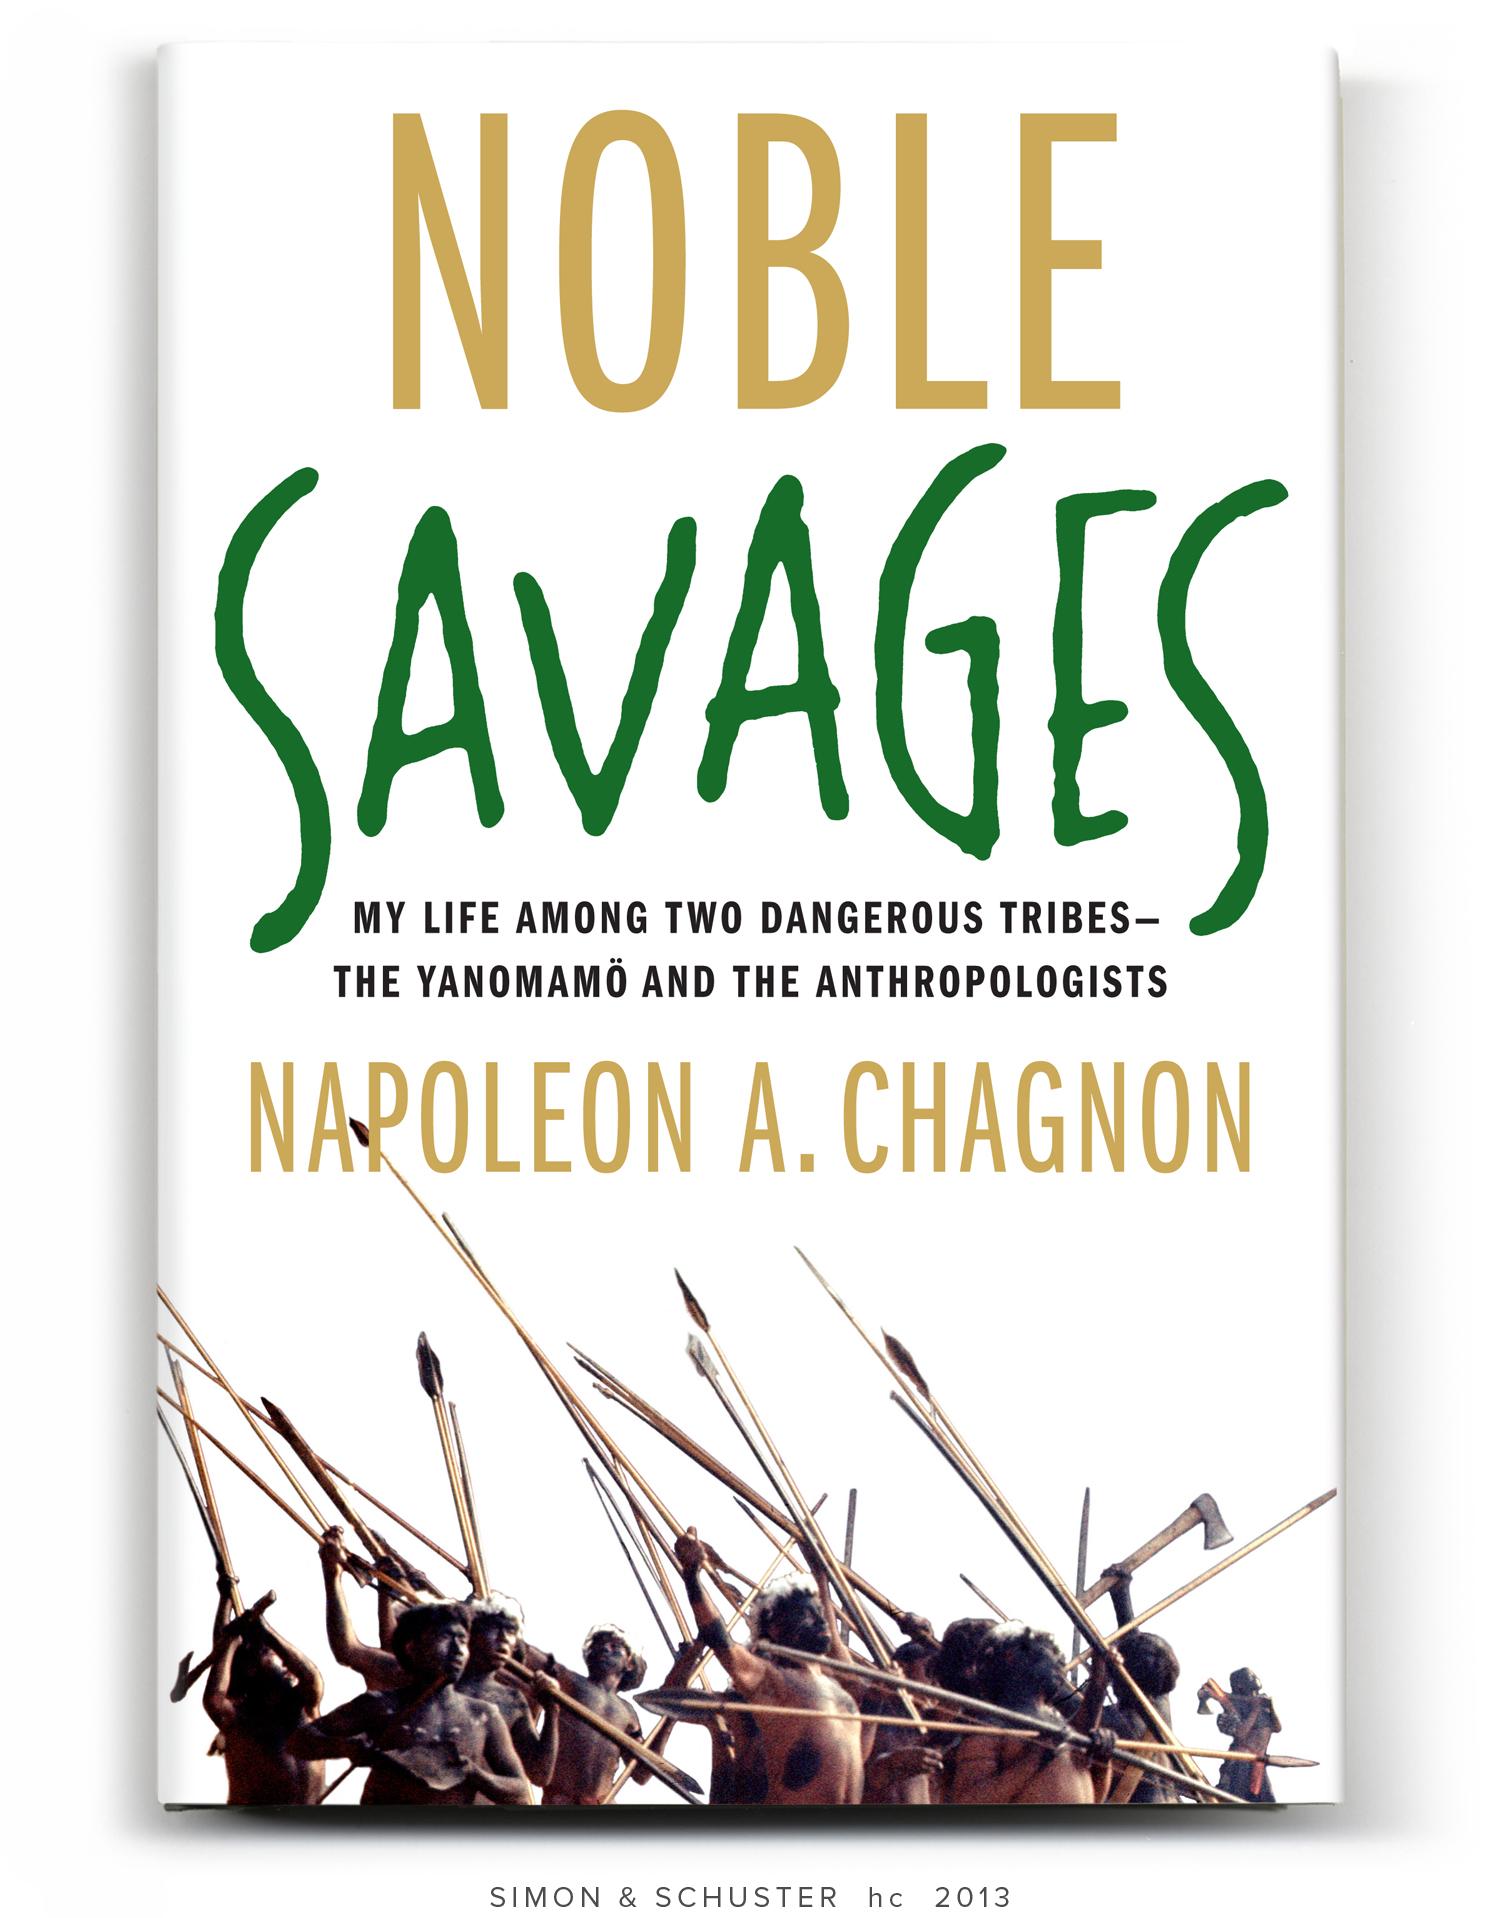 NOBLE-SAVAGES-hc-ss6.jpg